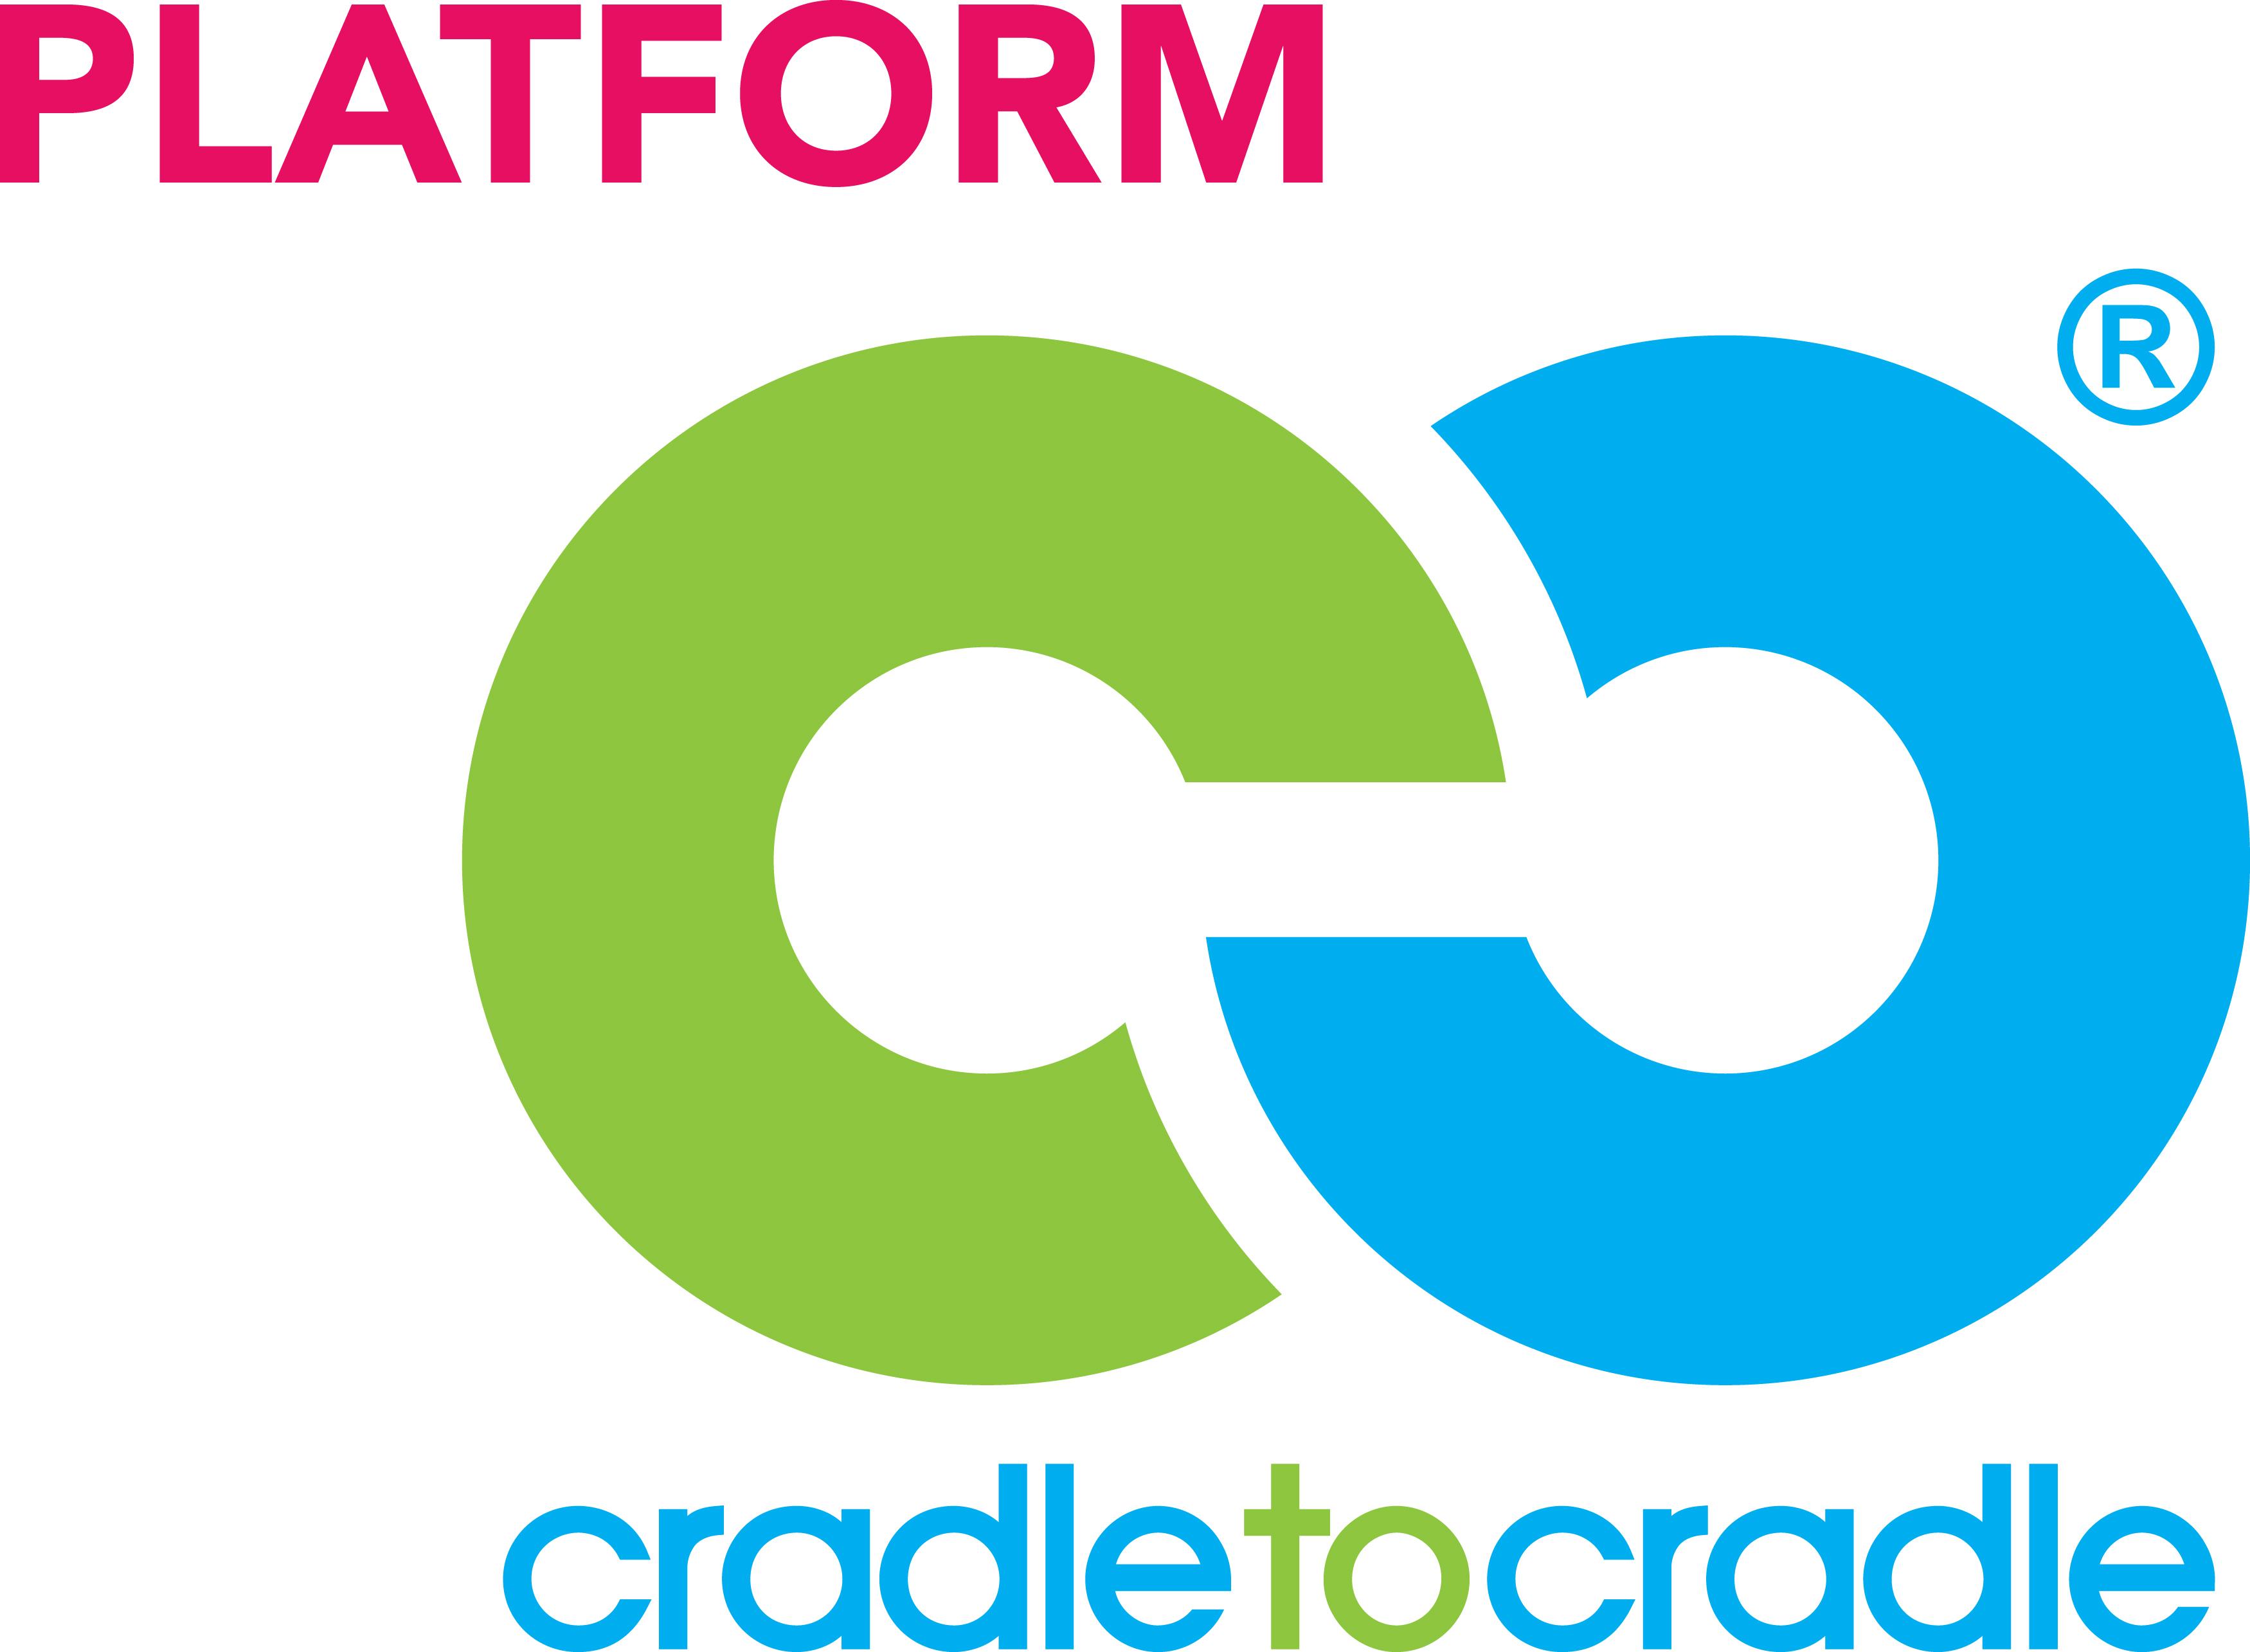 cradle to cradle platform mvo vlaanderen. Black Bedroom Furniture Sets. Home Design Ideas